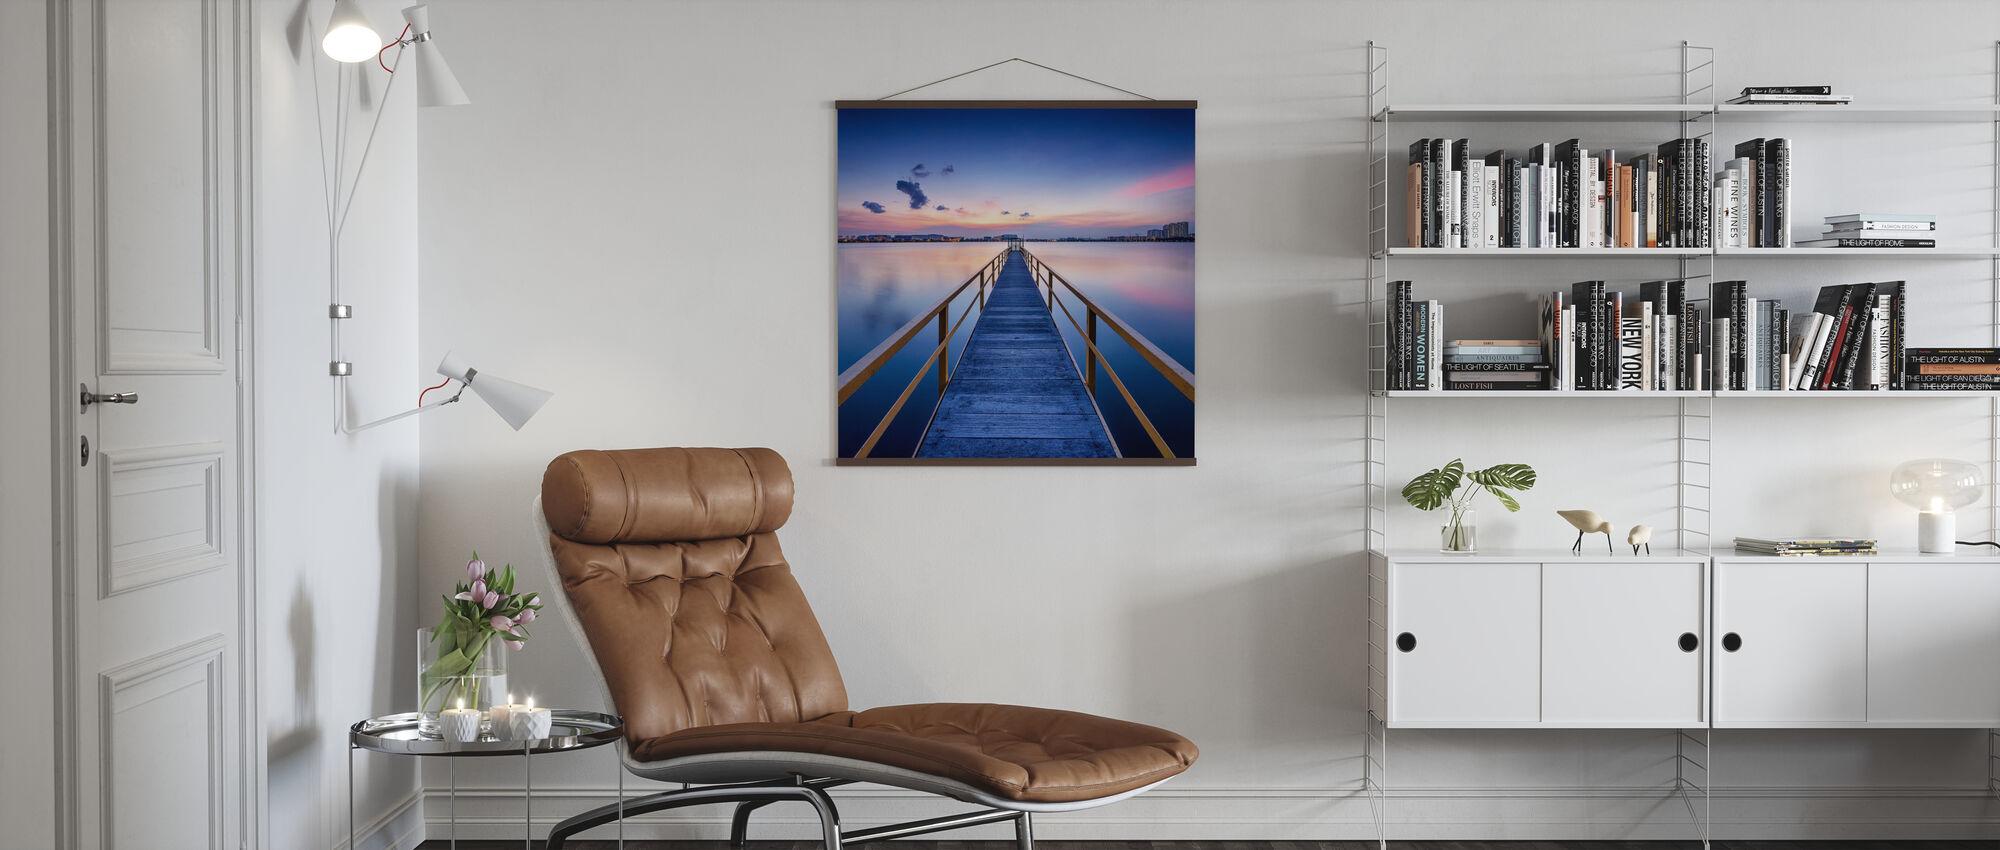 Rosy Sunset Pier - Poster - Living Room